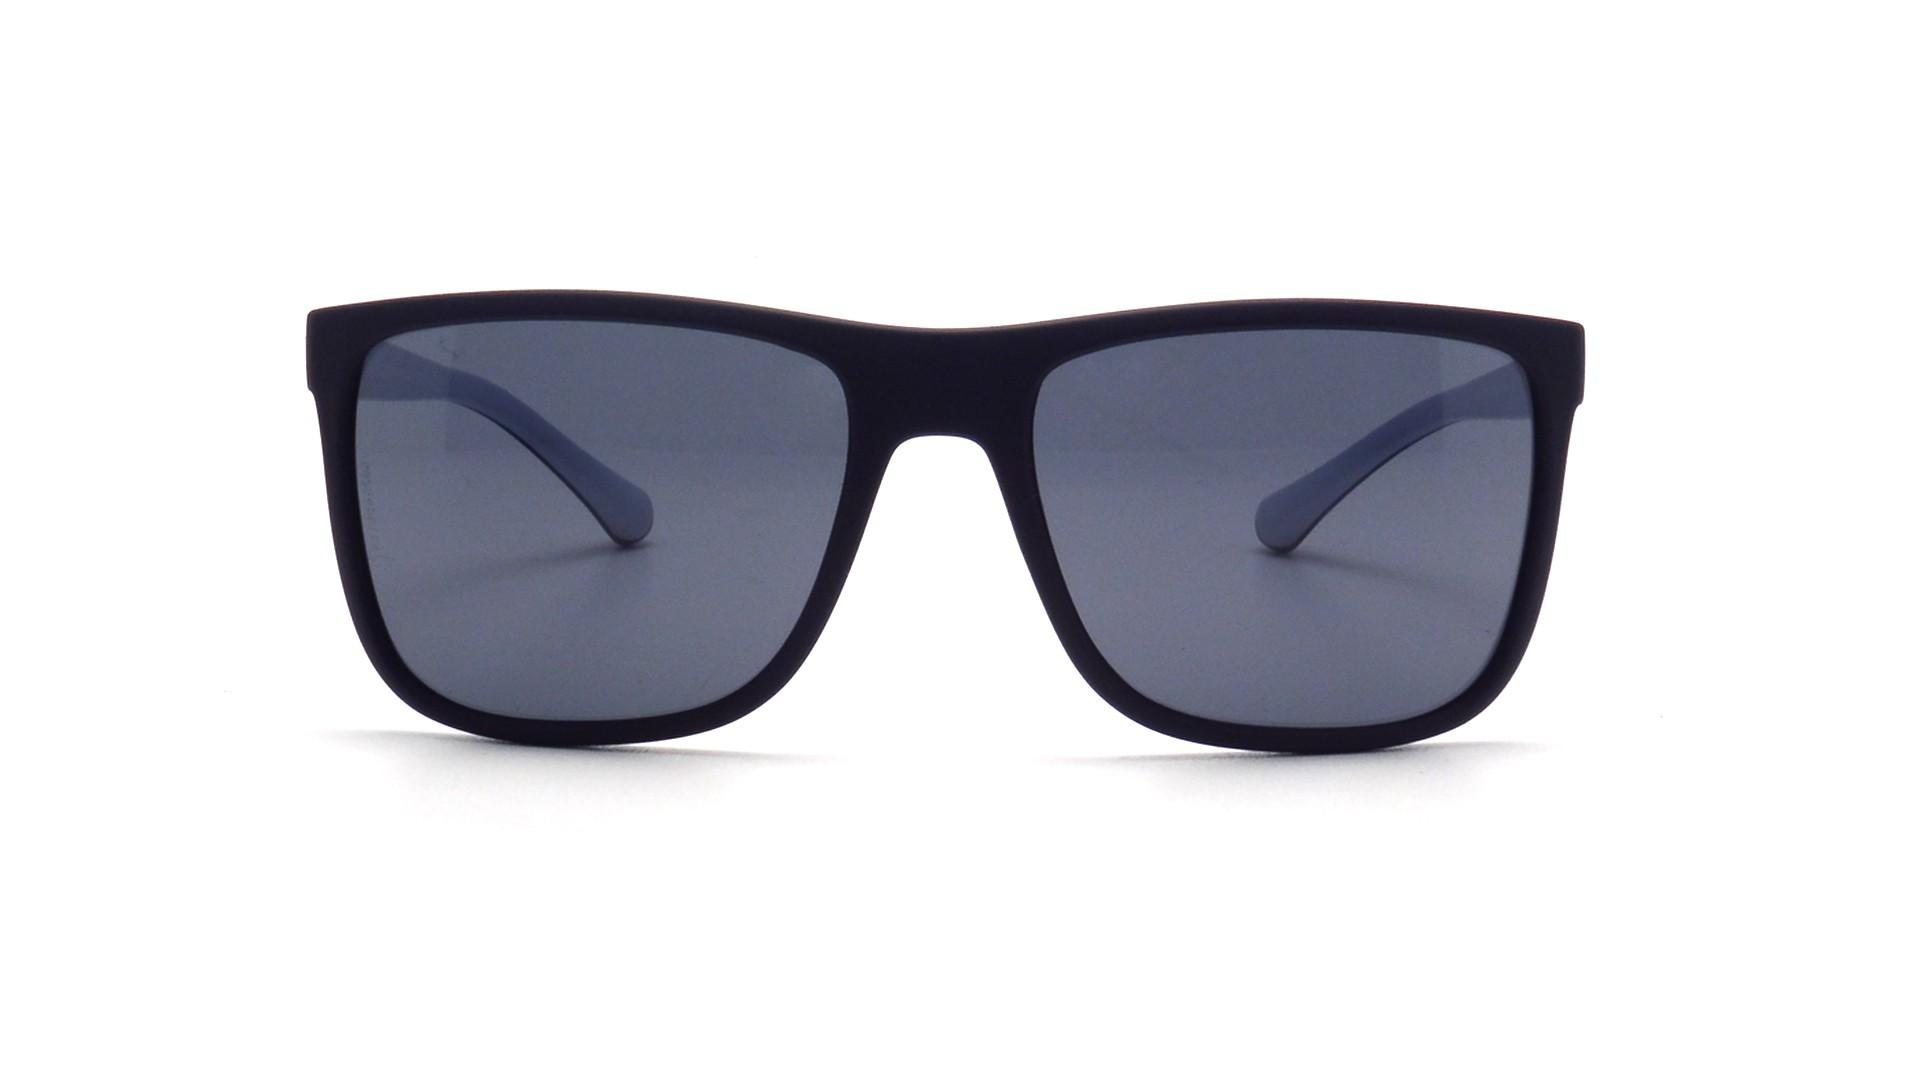 d19cfabc3f9 Dolce   Gabbana Dg6086 Sunglasses